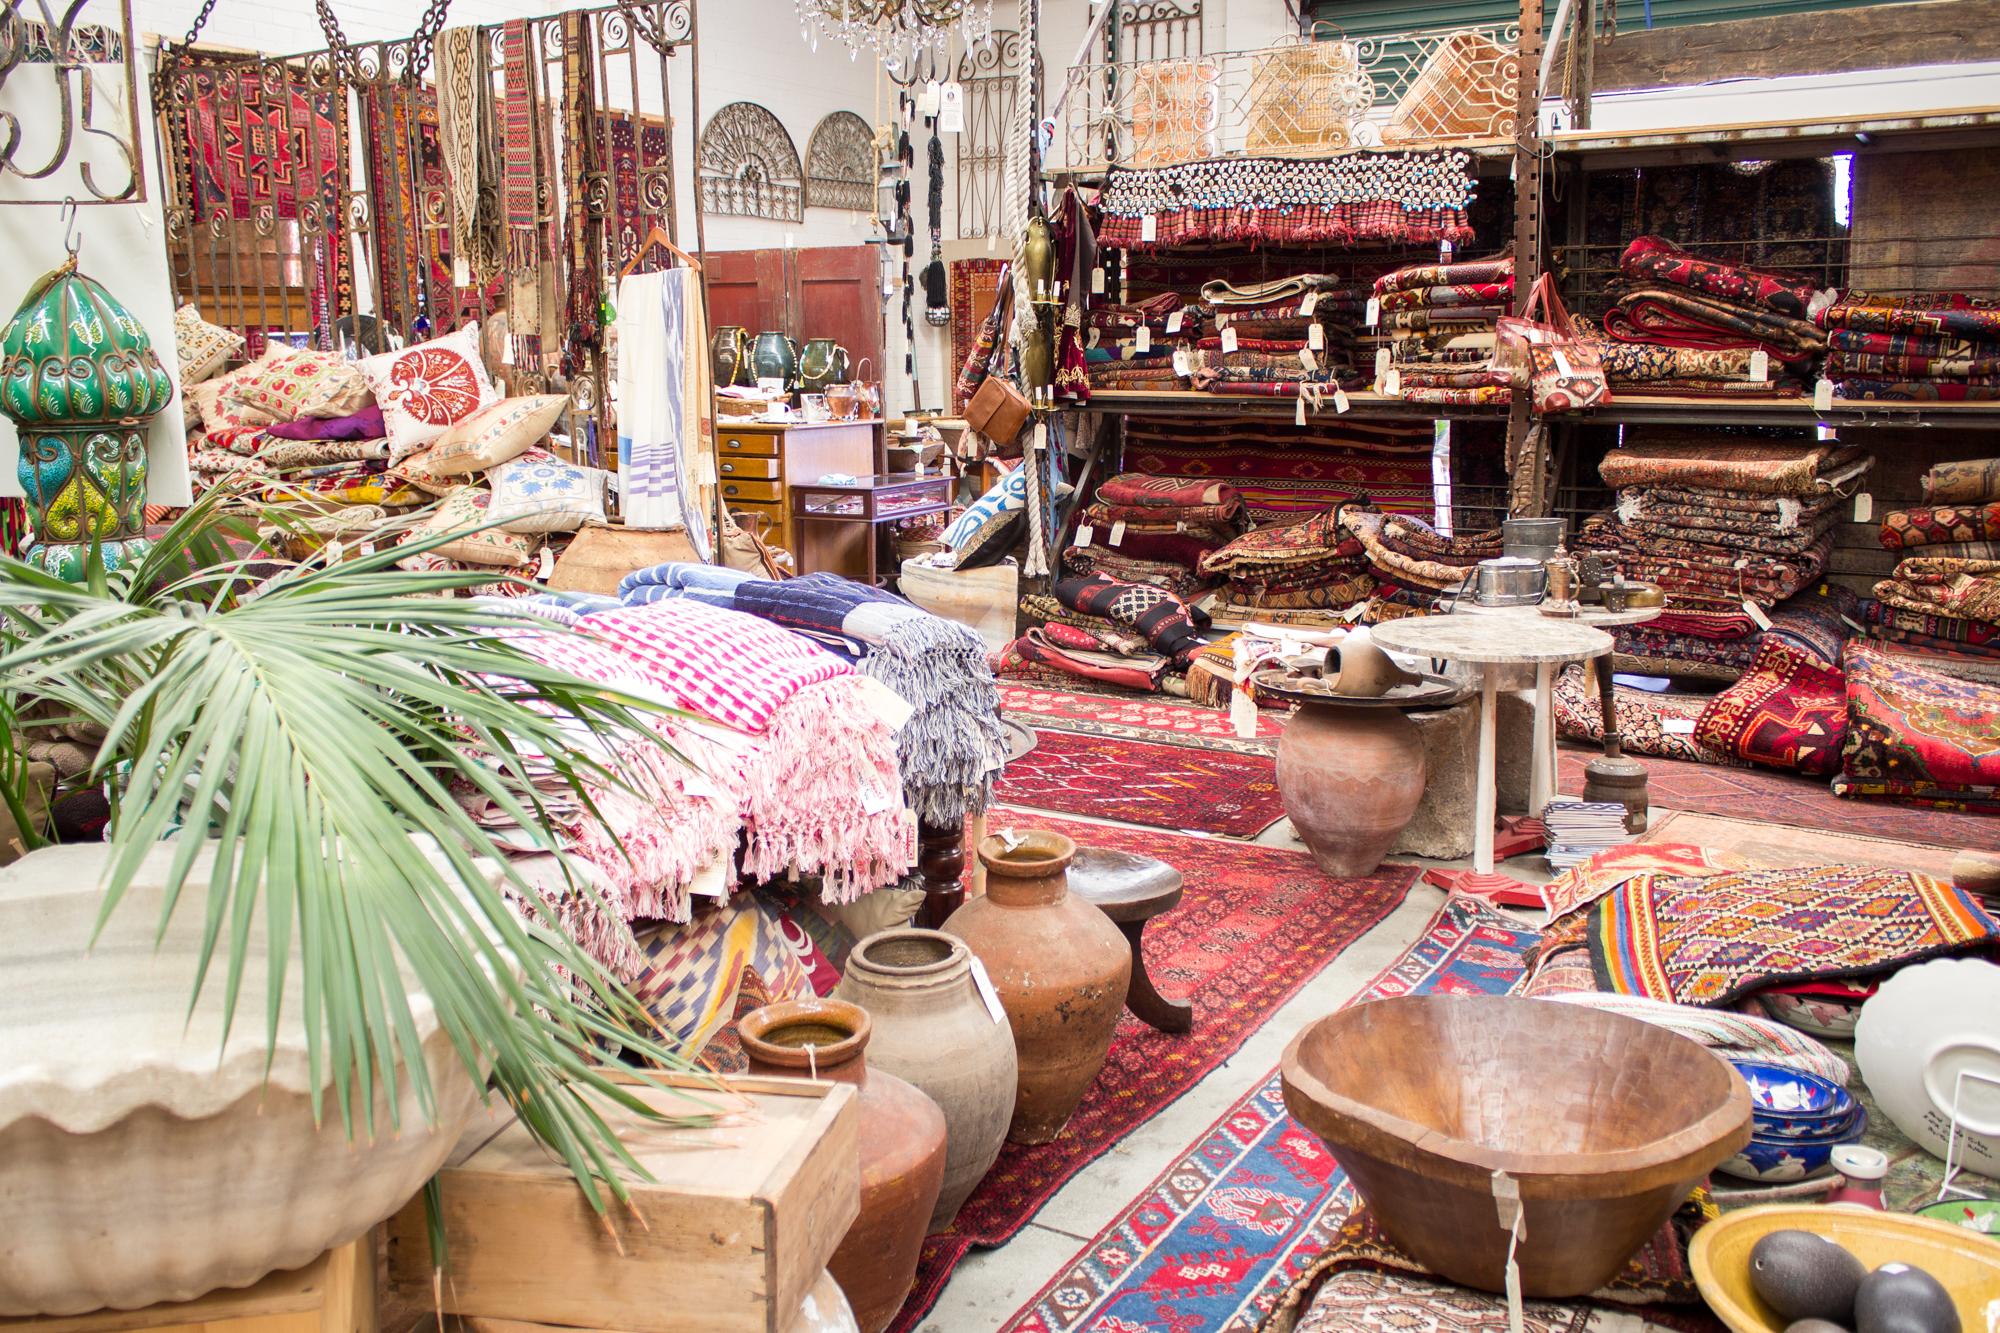 Ottoman Empire antiques, rugs shop picture